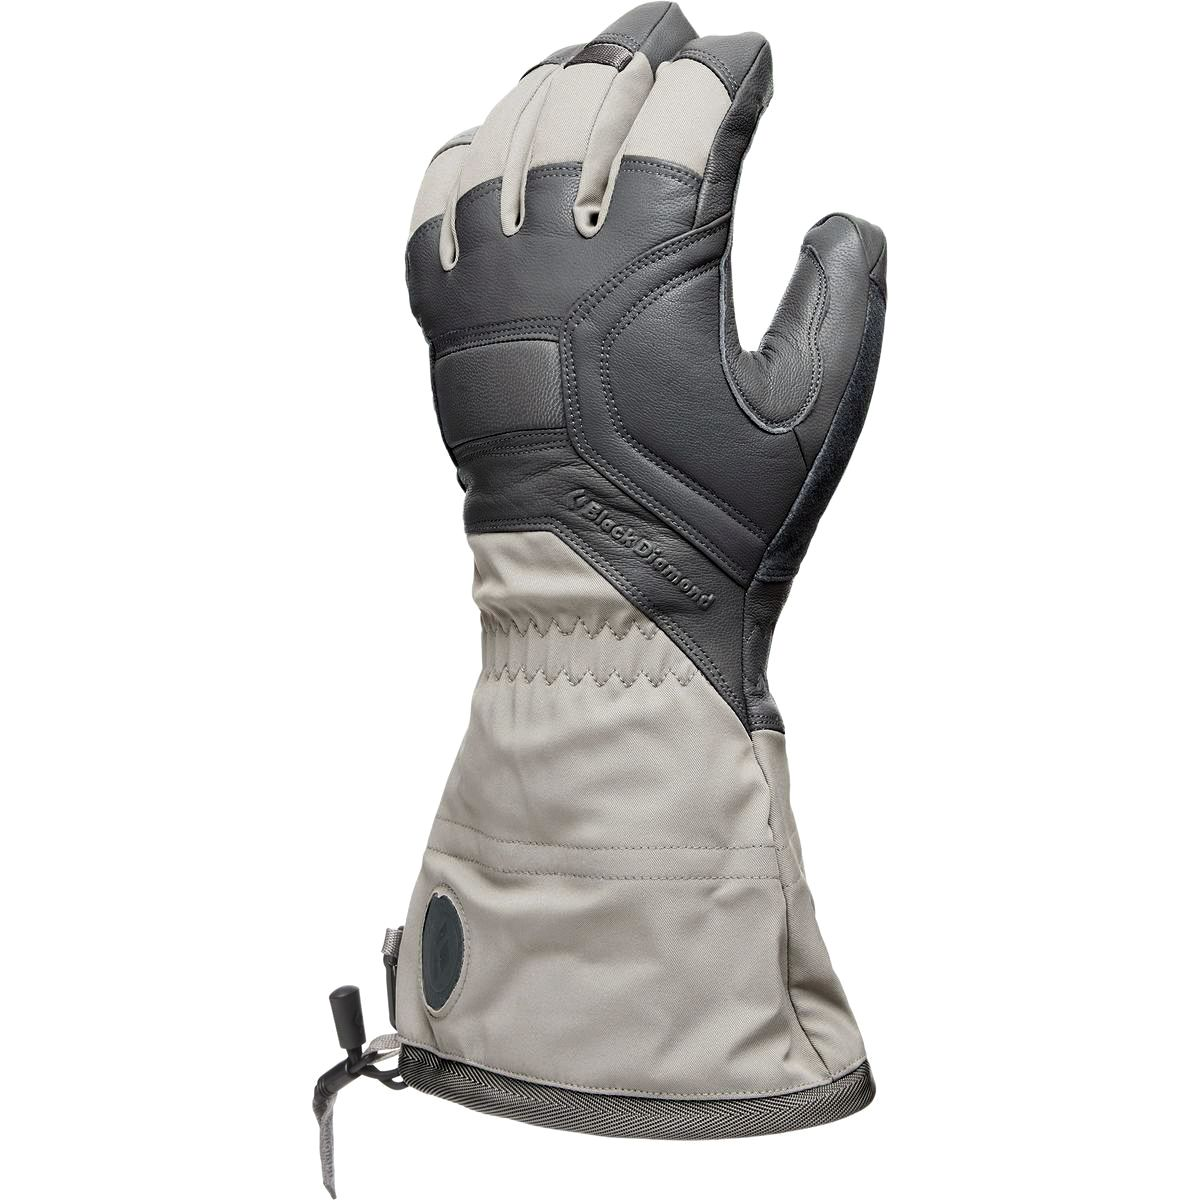 Guide Ski Glove - Women